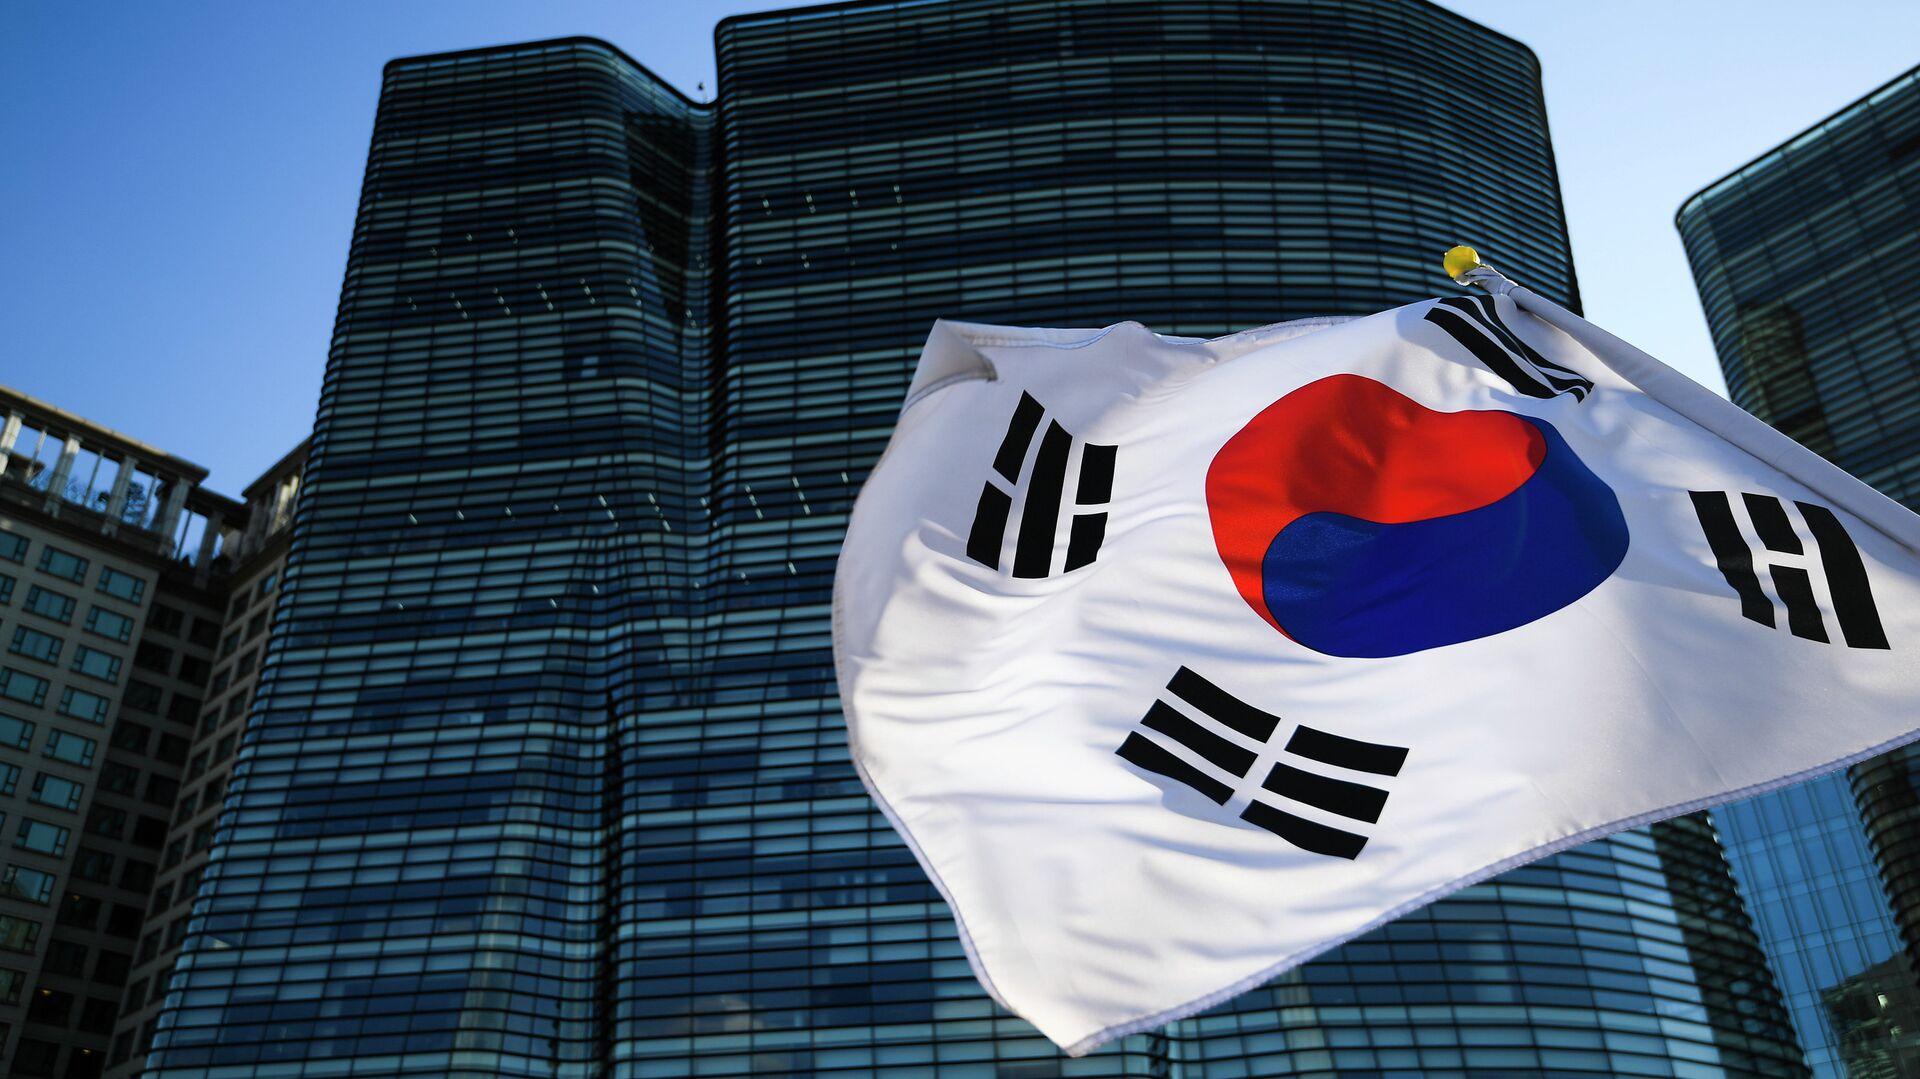 Флаг Республики Корея - РИА Новости, 1920, 01.04.2021